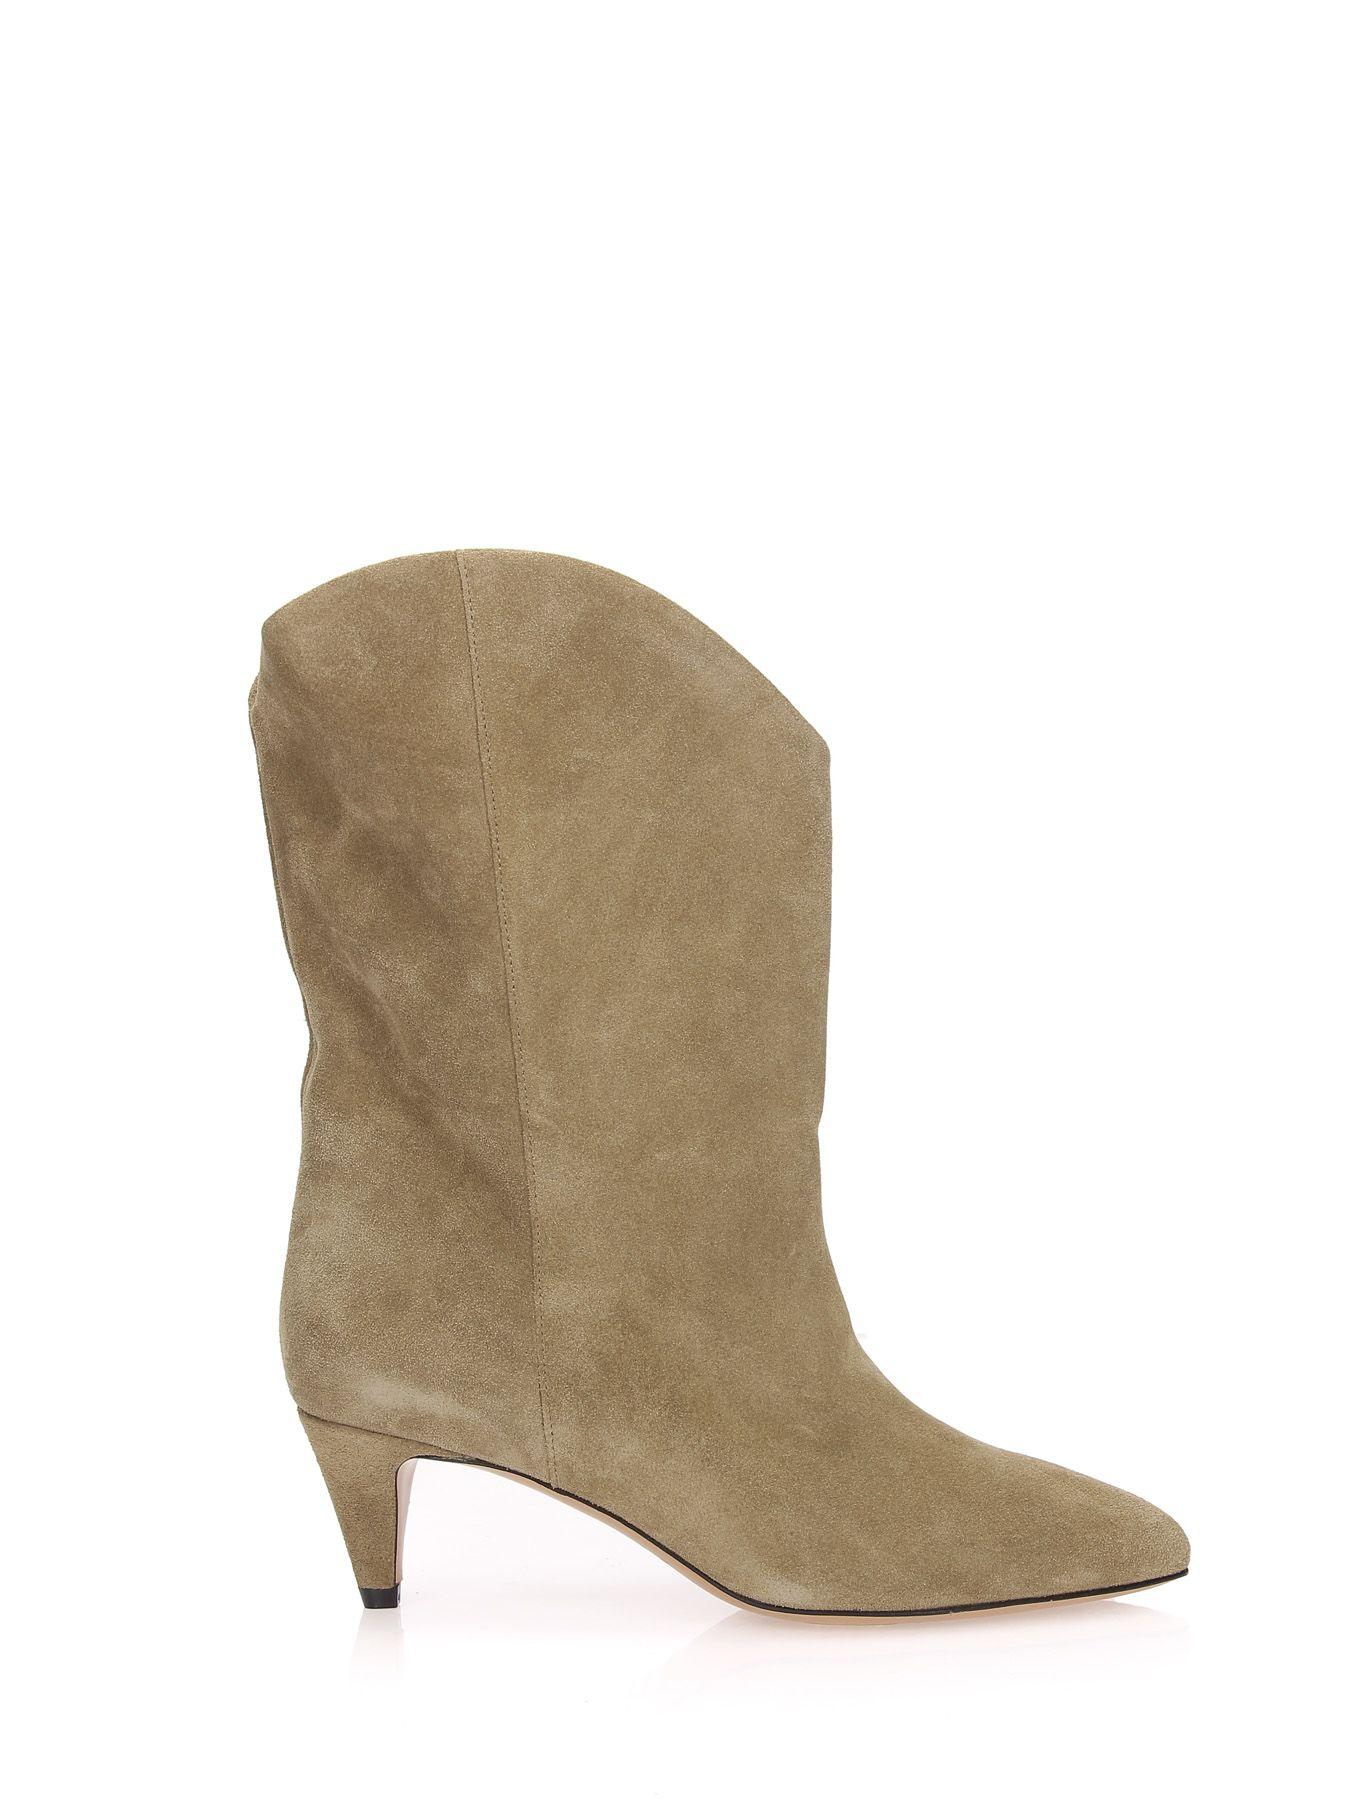 dfa1352645 Etoile Isabel Marant Dernee Ankle Boots In Beige | ModeSens